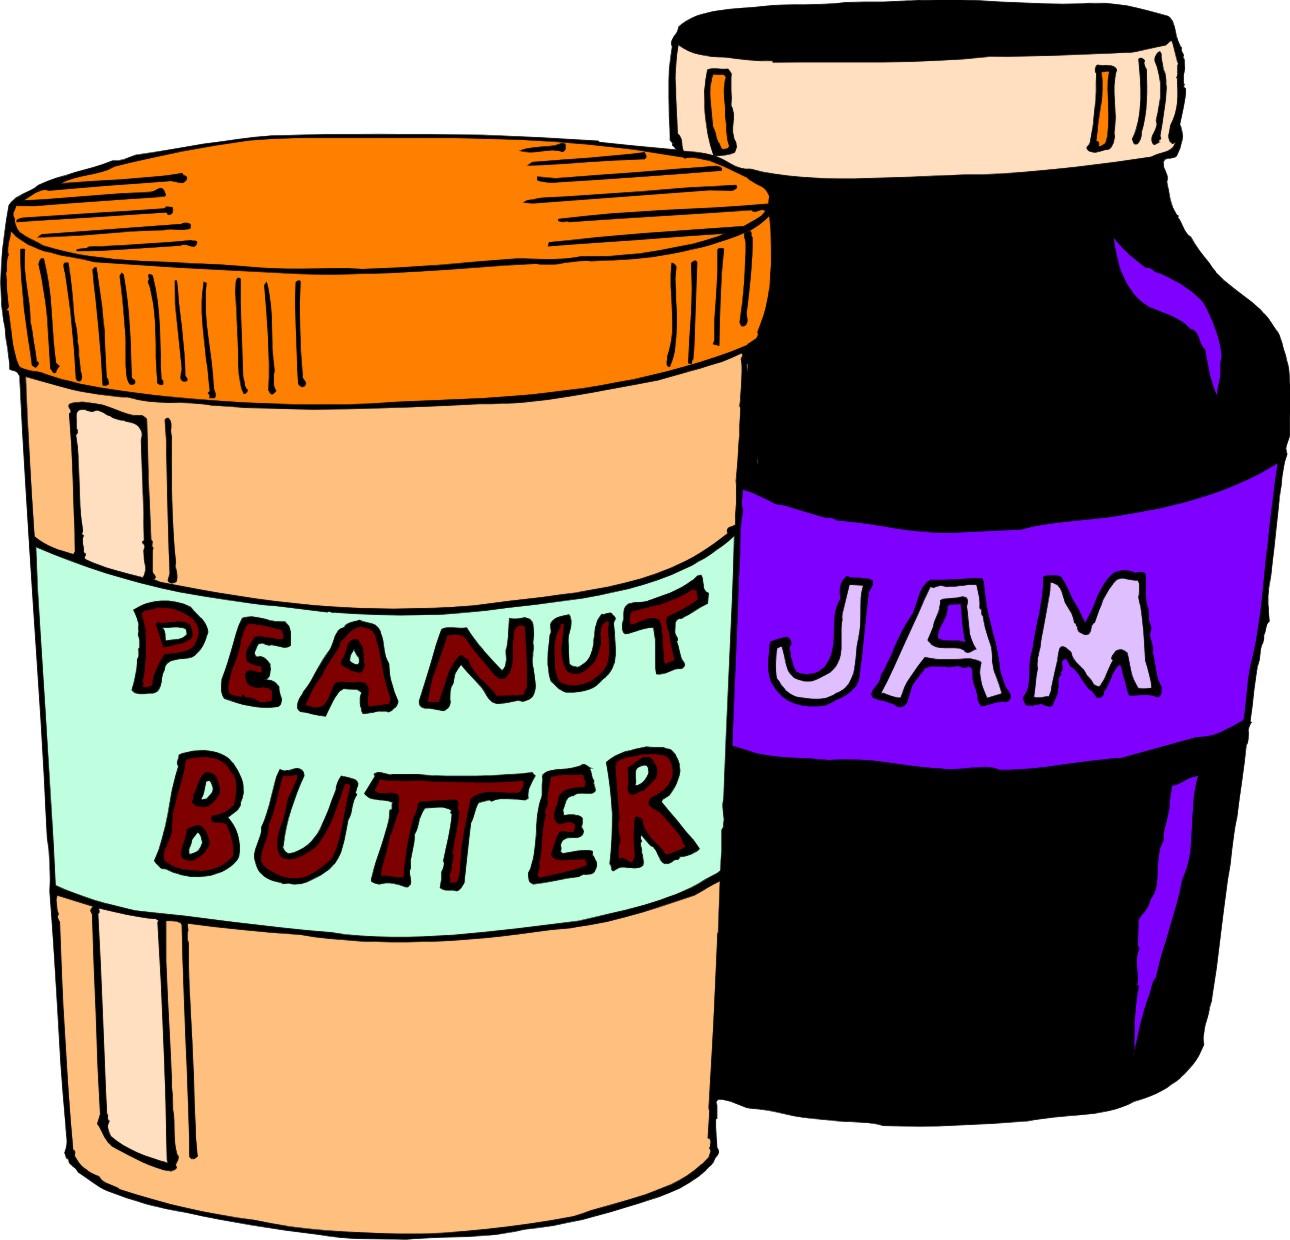 1290x1240 Peanut Butter Jelly Clip Art Free Image